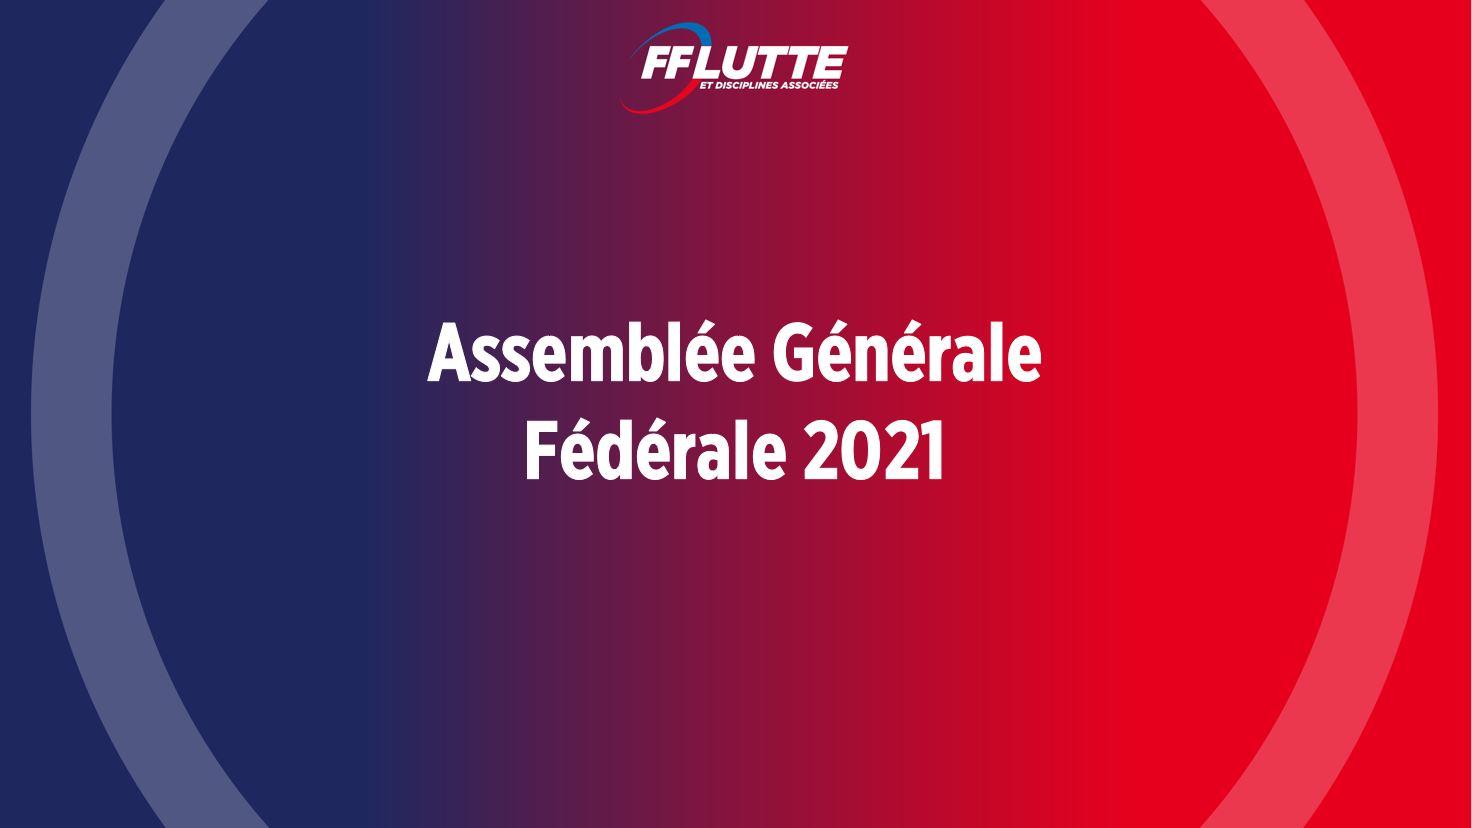 Assemblée Générale Fédérale 2021